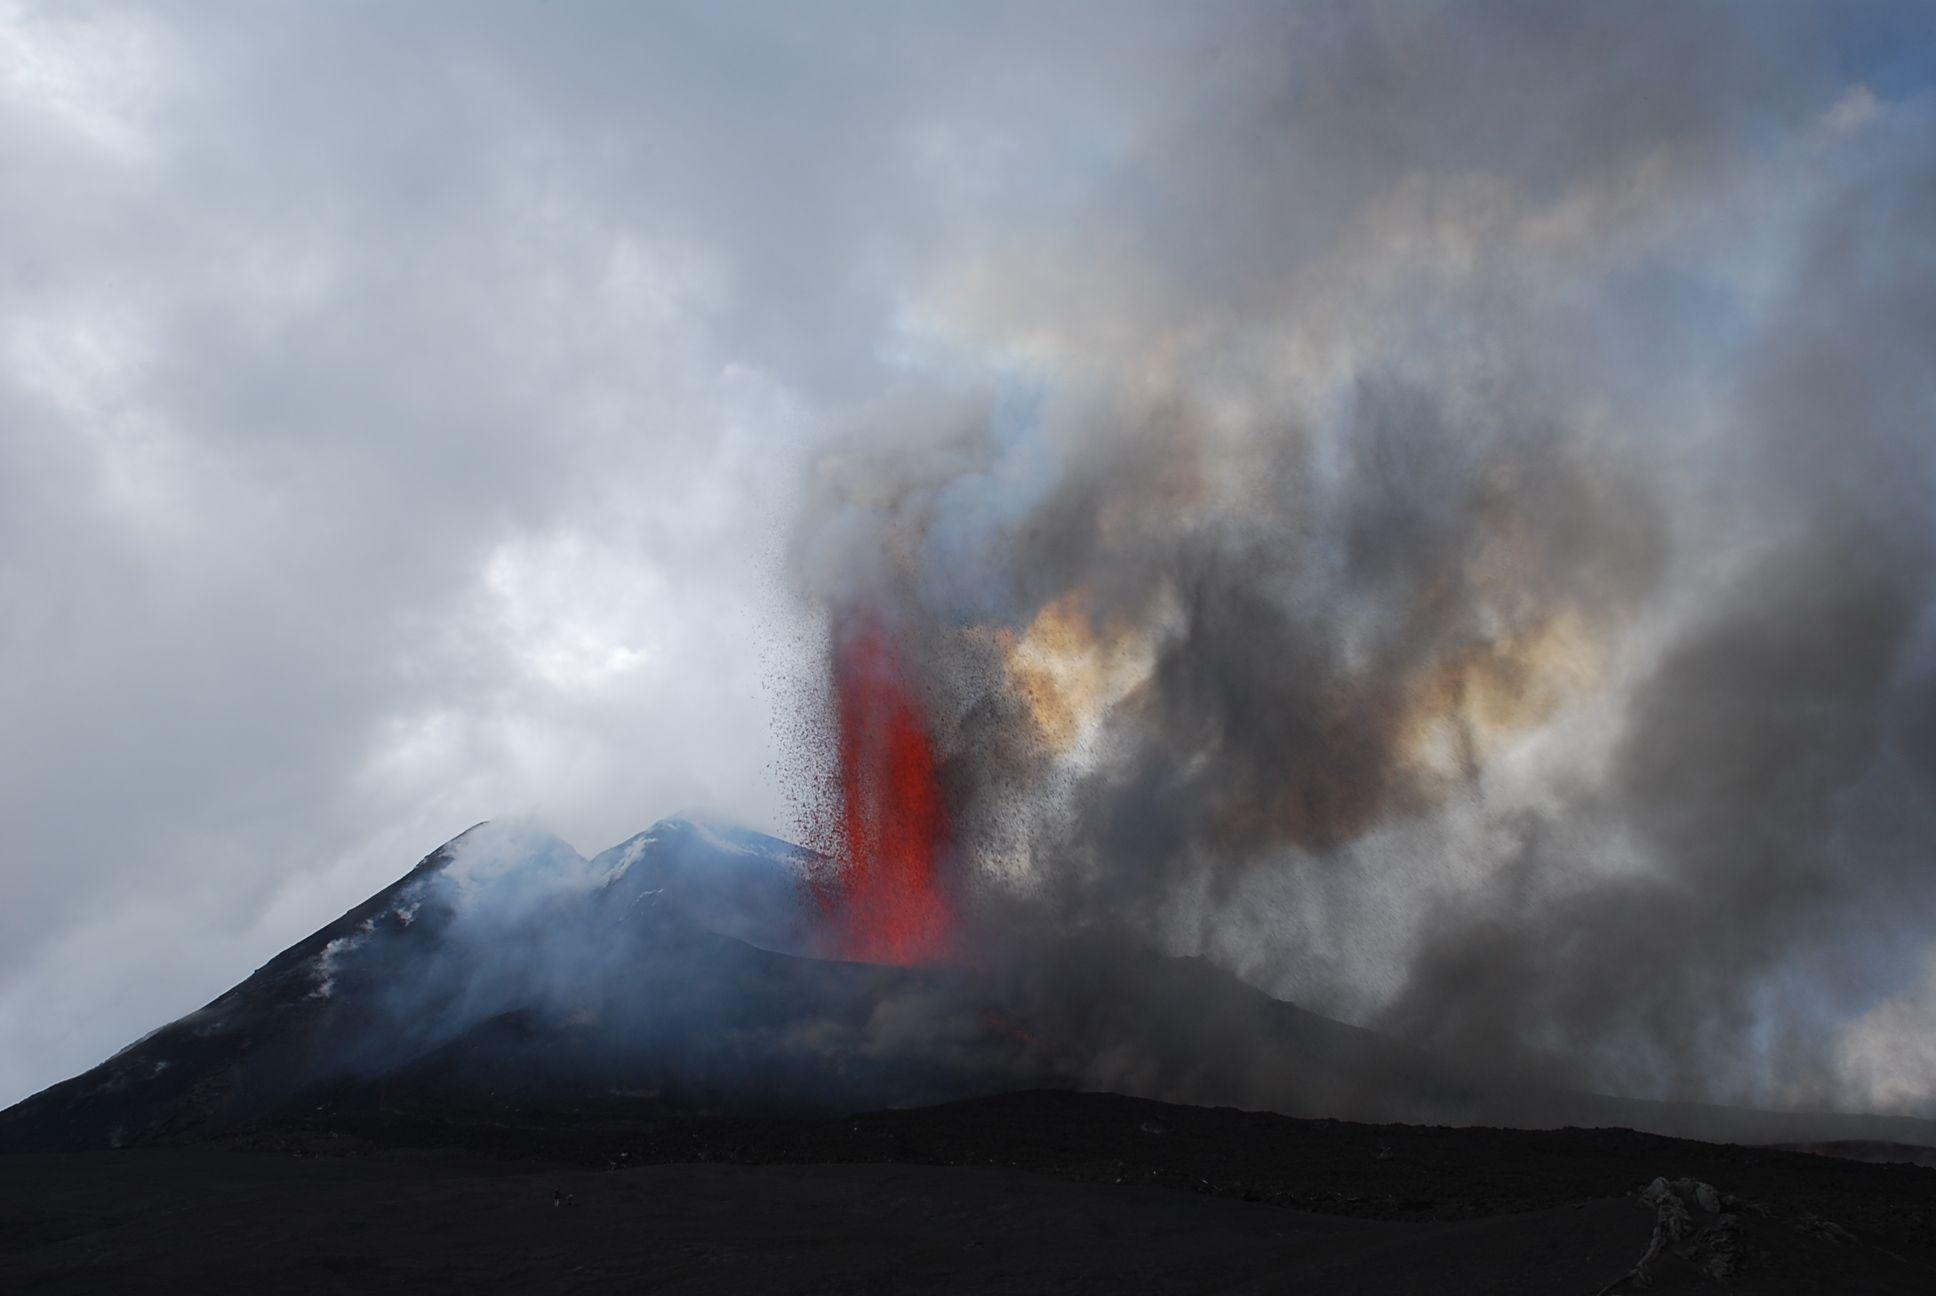 Mount Etna Eruption 04 09 2007 Vulcano Etna Sicily Italy